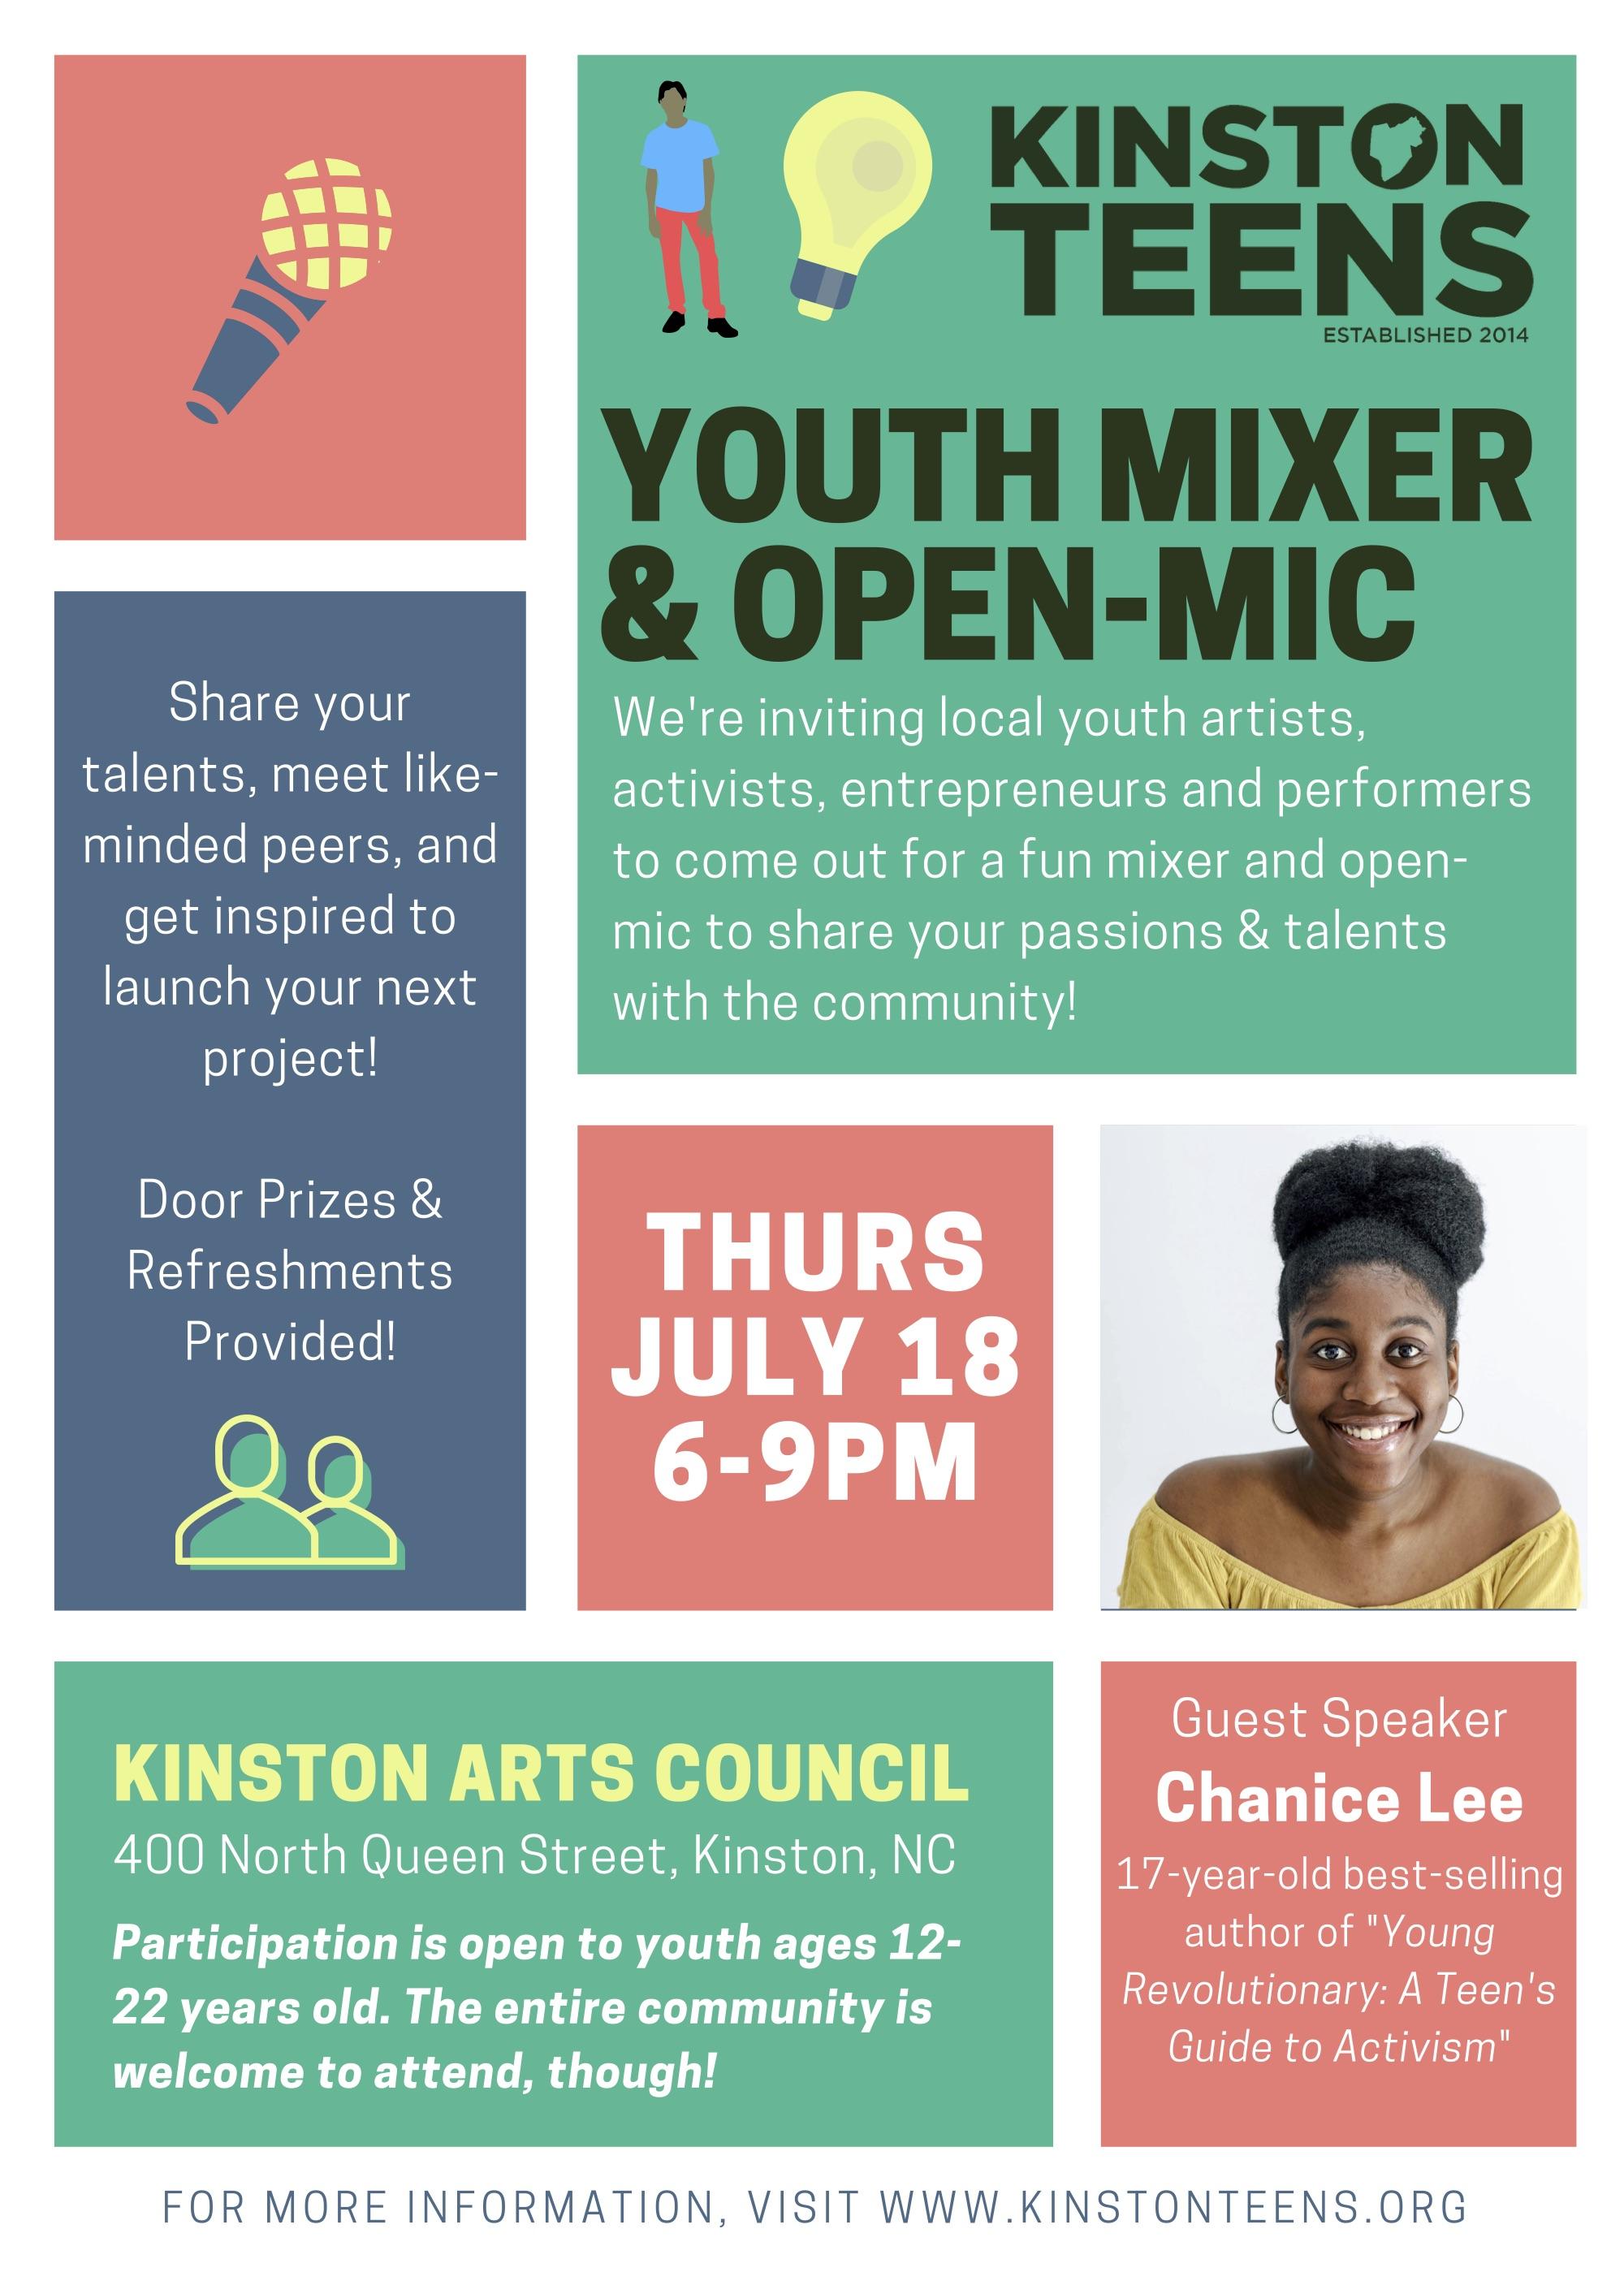 KT Youth Mixer Flyer.jpg